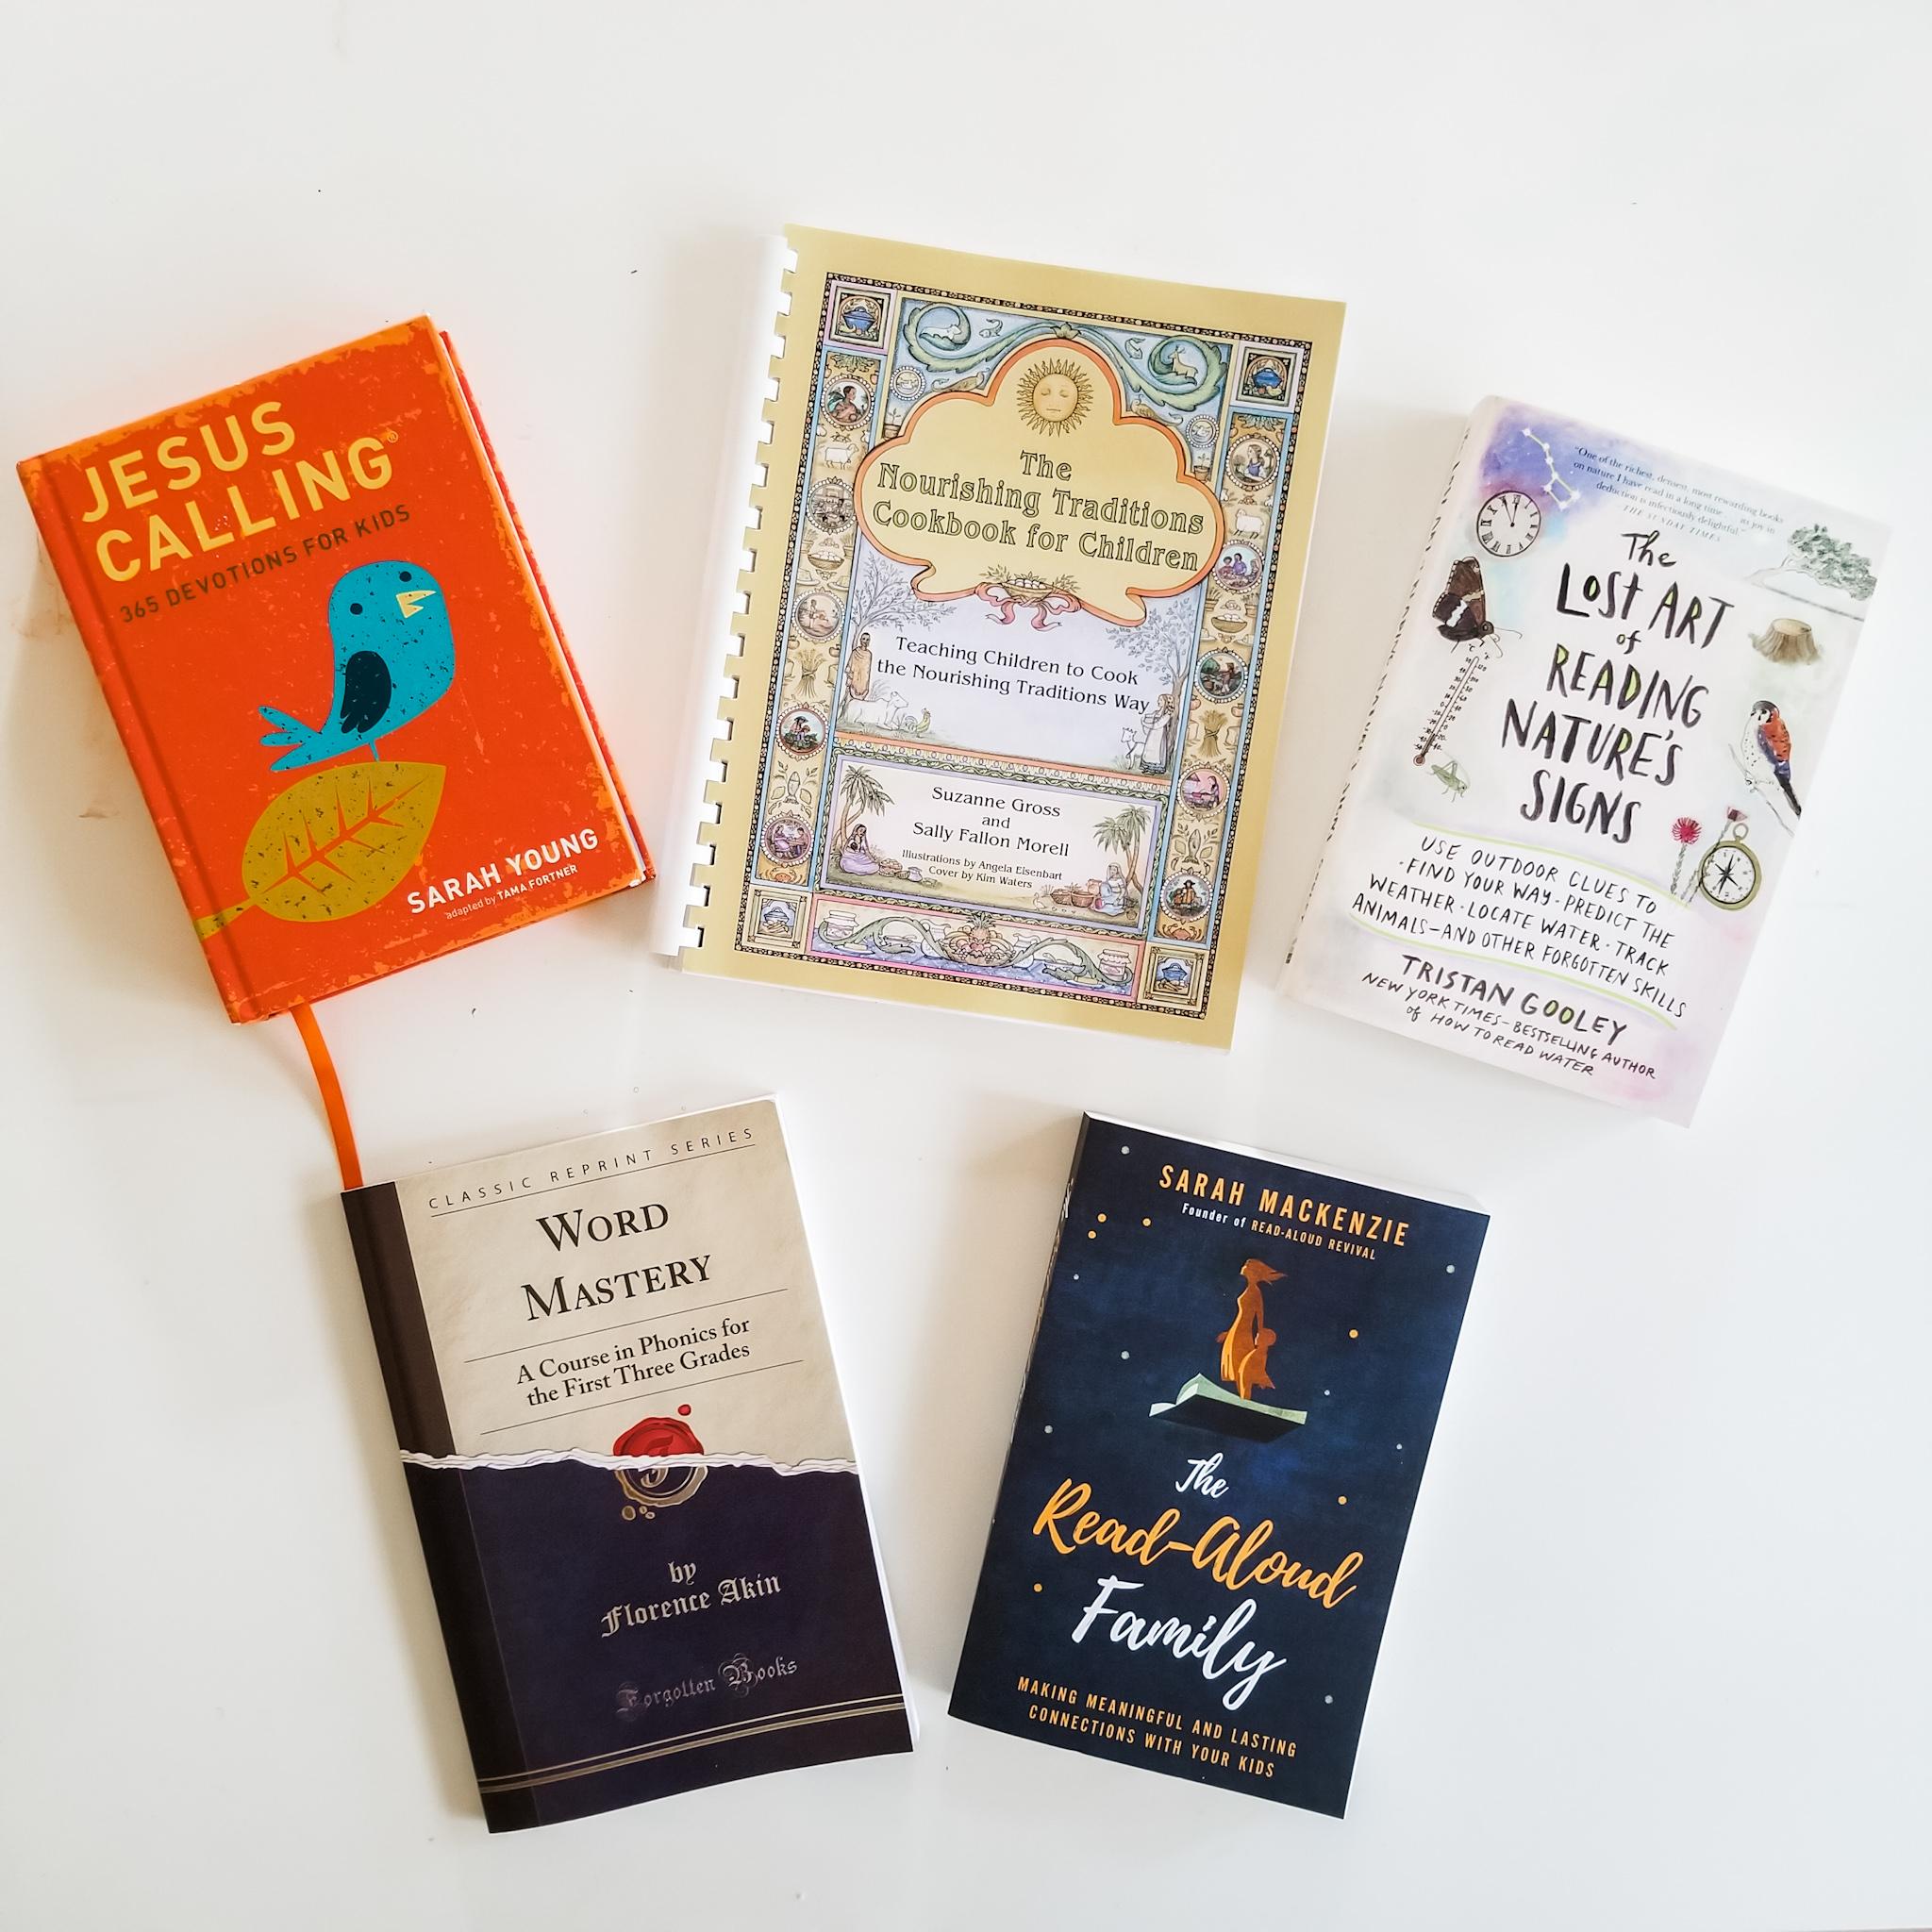 Charlotte Mason Homeschool Books The Semi-Minimalist.jpeg